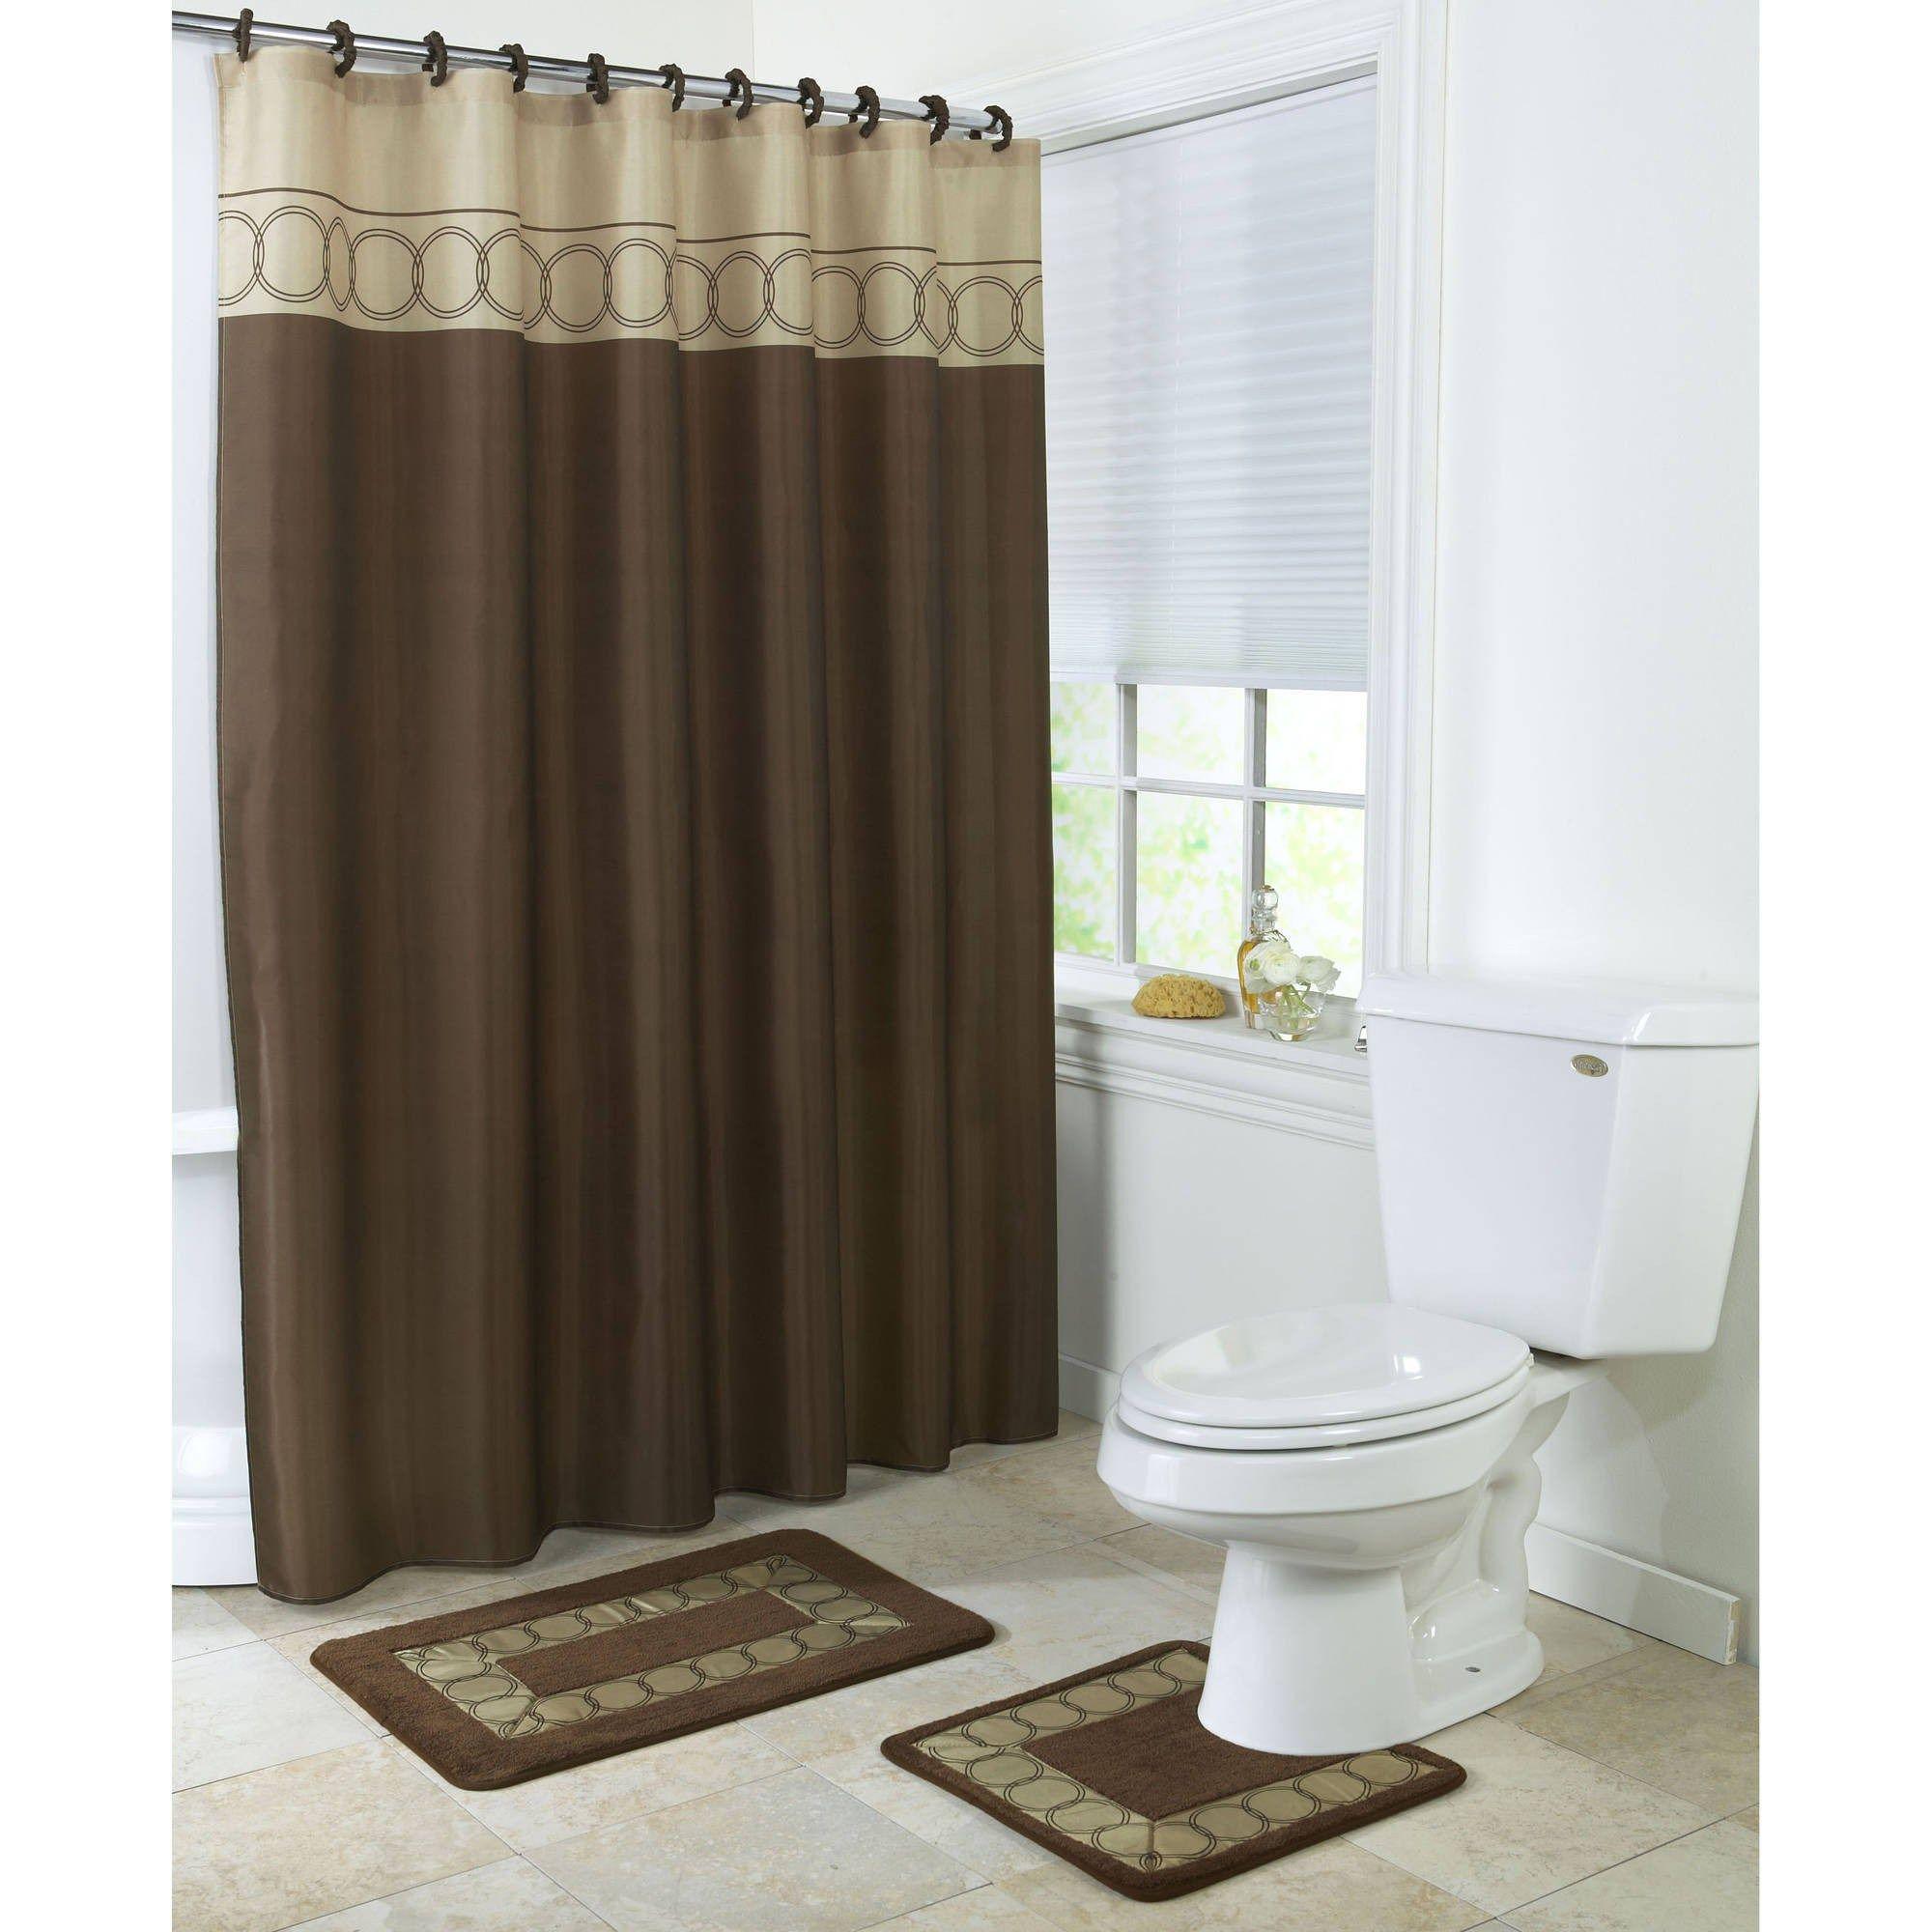 Unique Walmart Shower Curtain Liner Check More At Https Homefurnitureone Com Walmart Shower Curtain Liner Shower Canada Nautical bathroom decor walmart